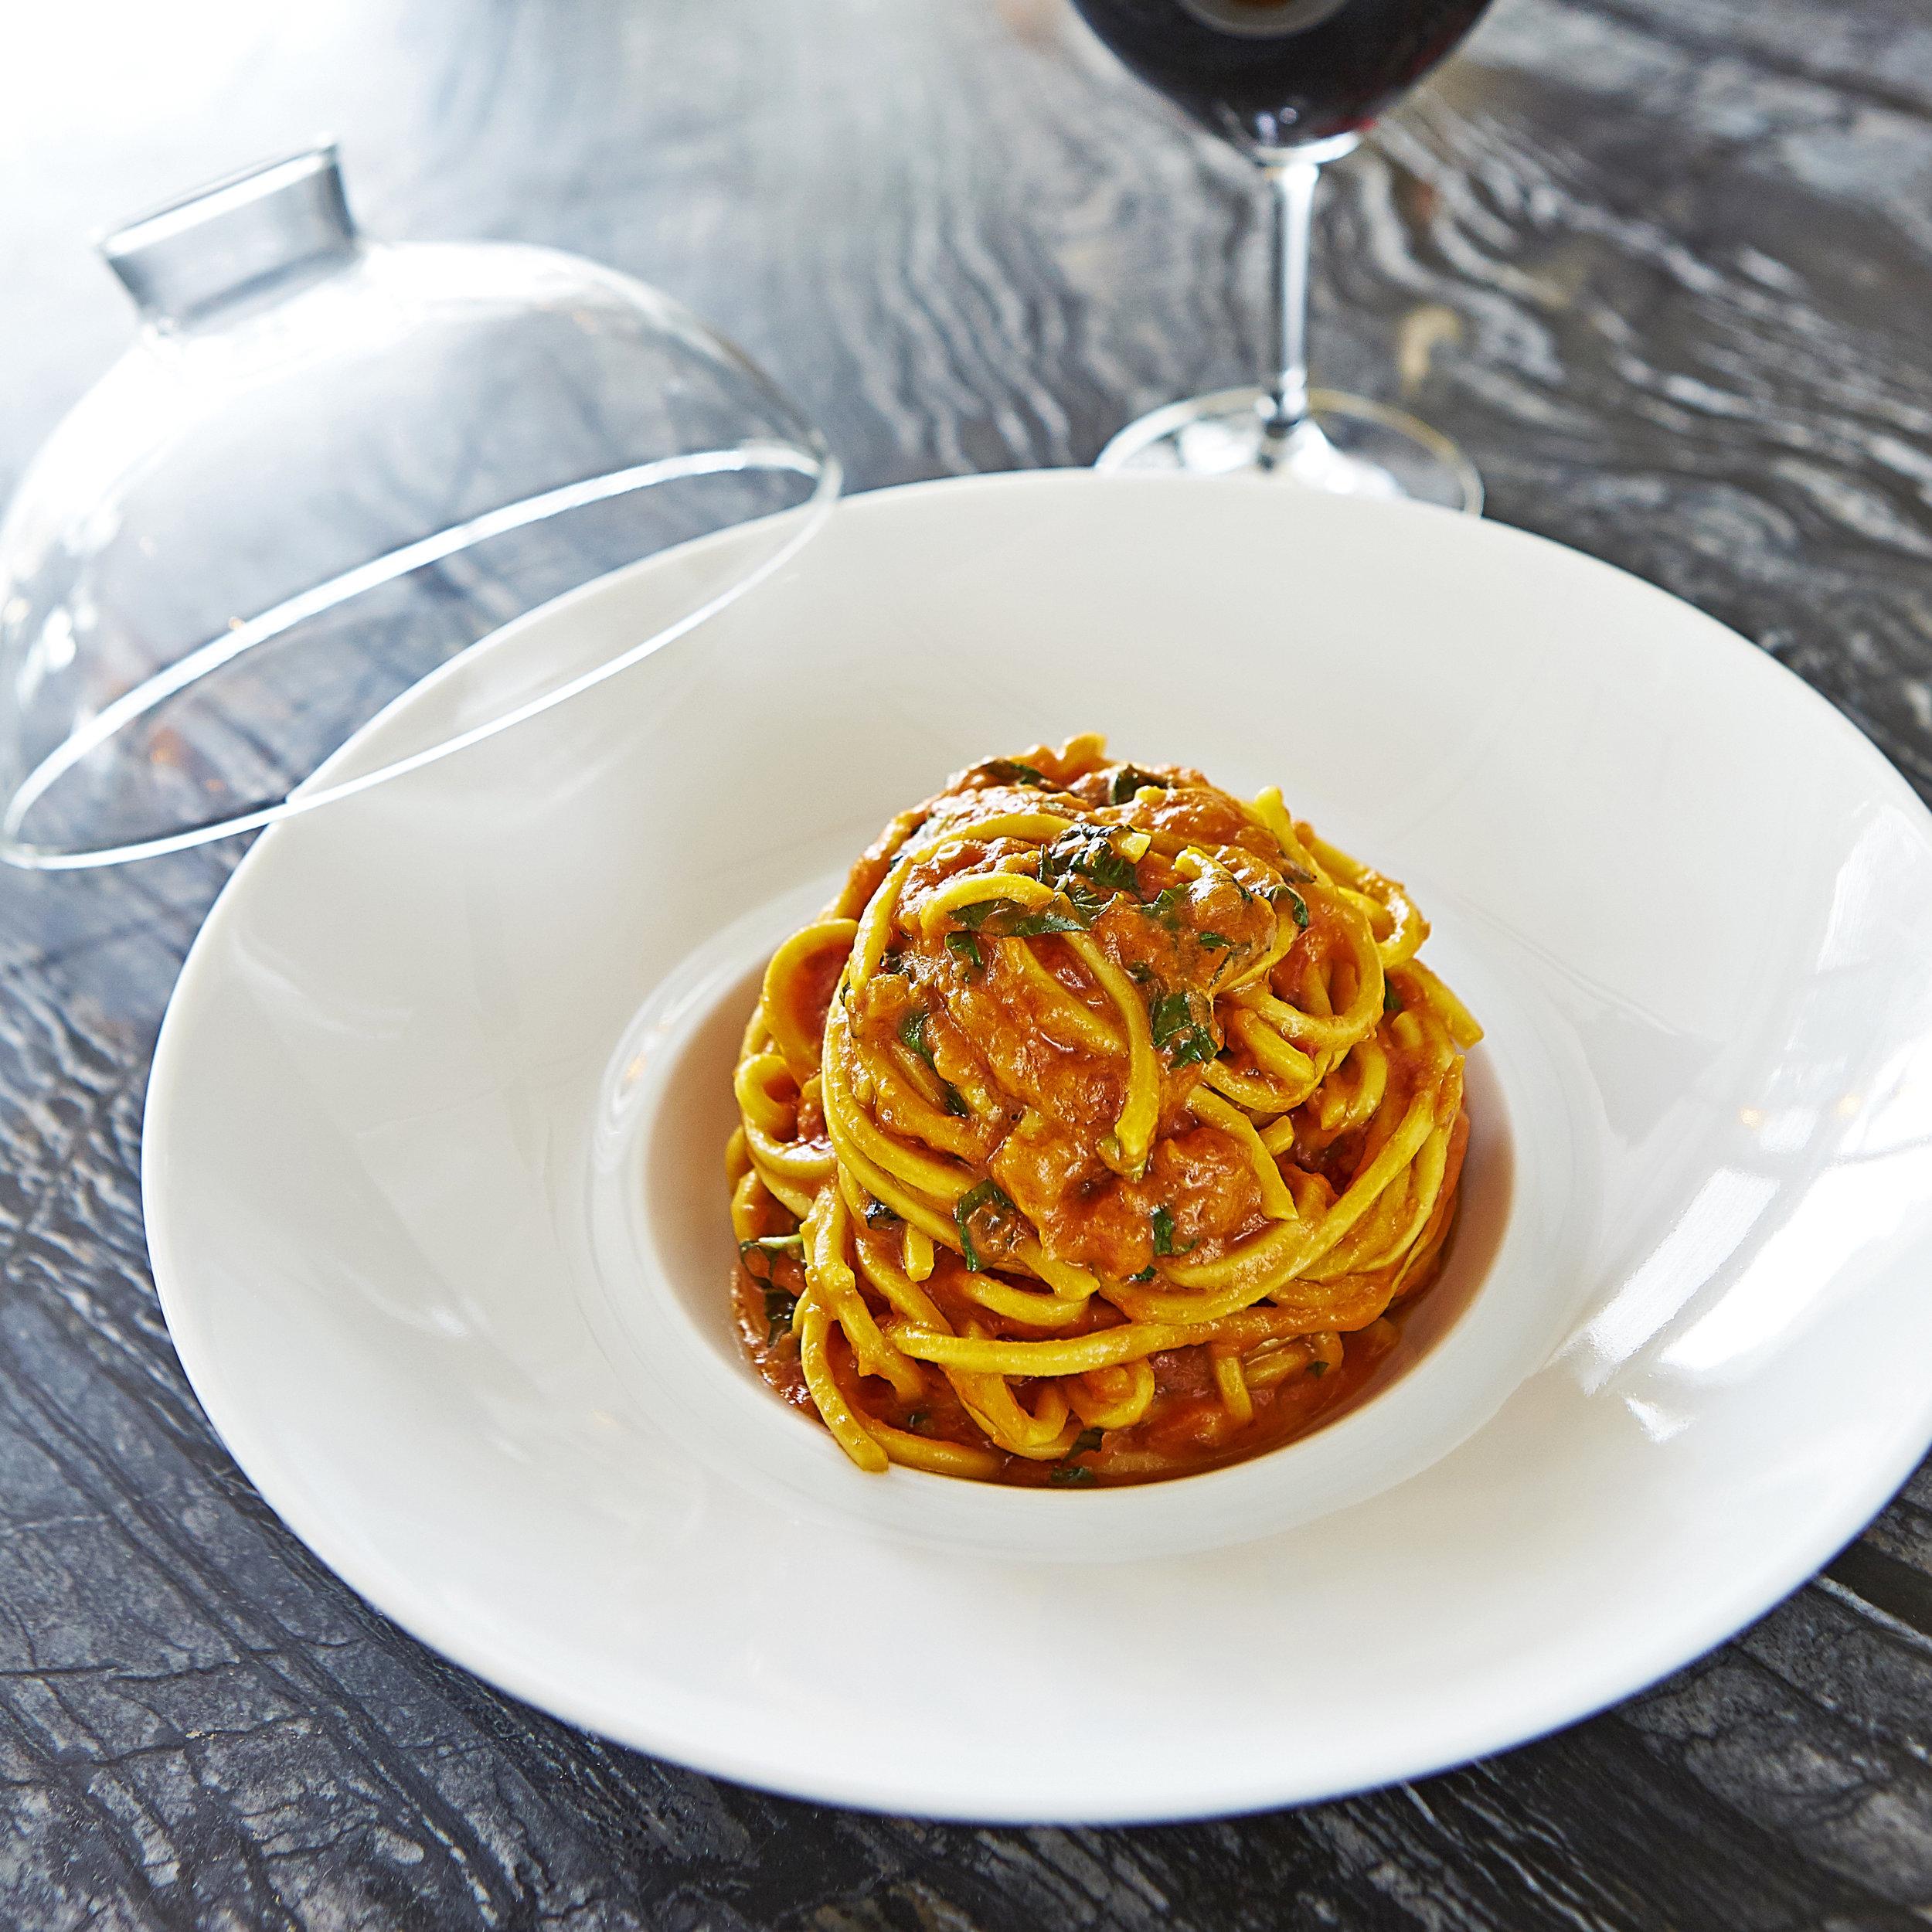 Spaghetti_Scarpetta_Photo-Credit-Michael-Pisarri.jpg